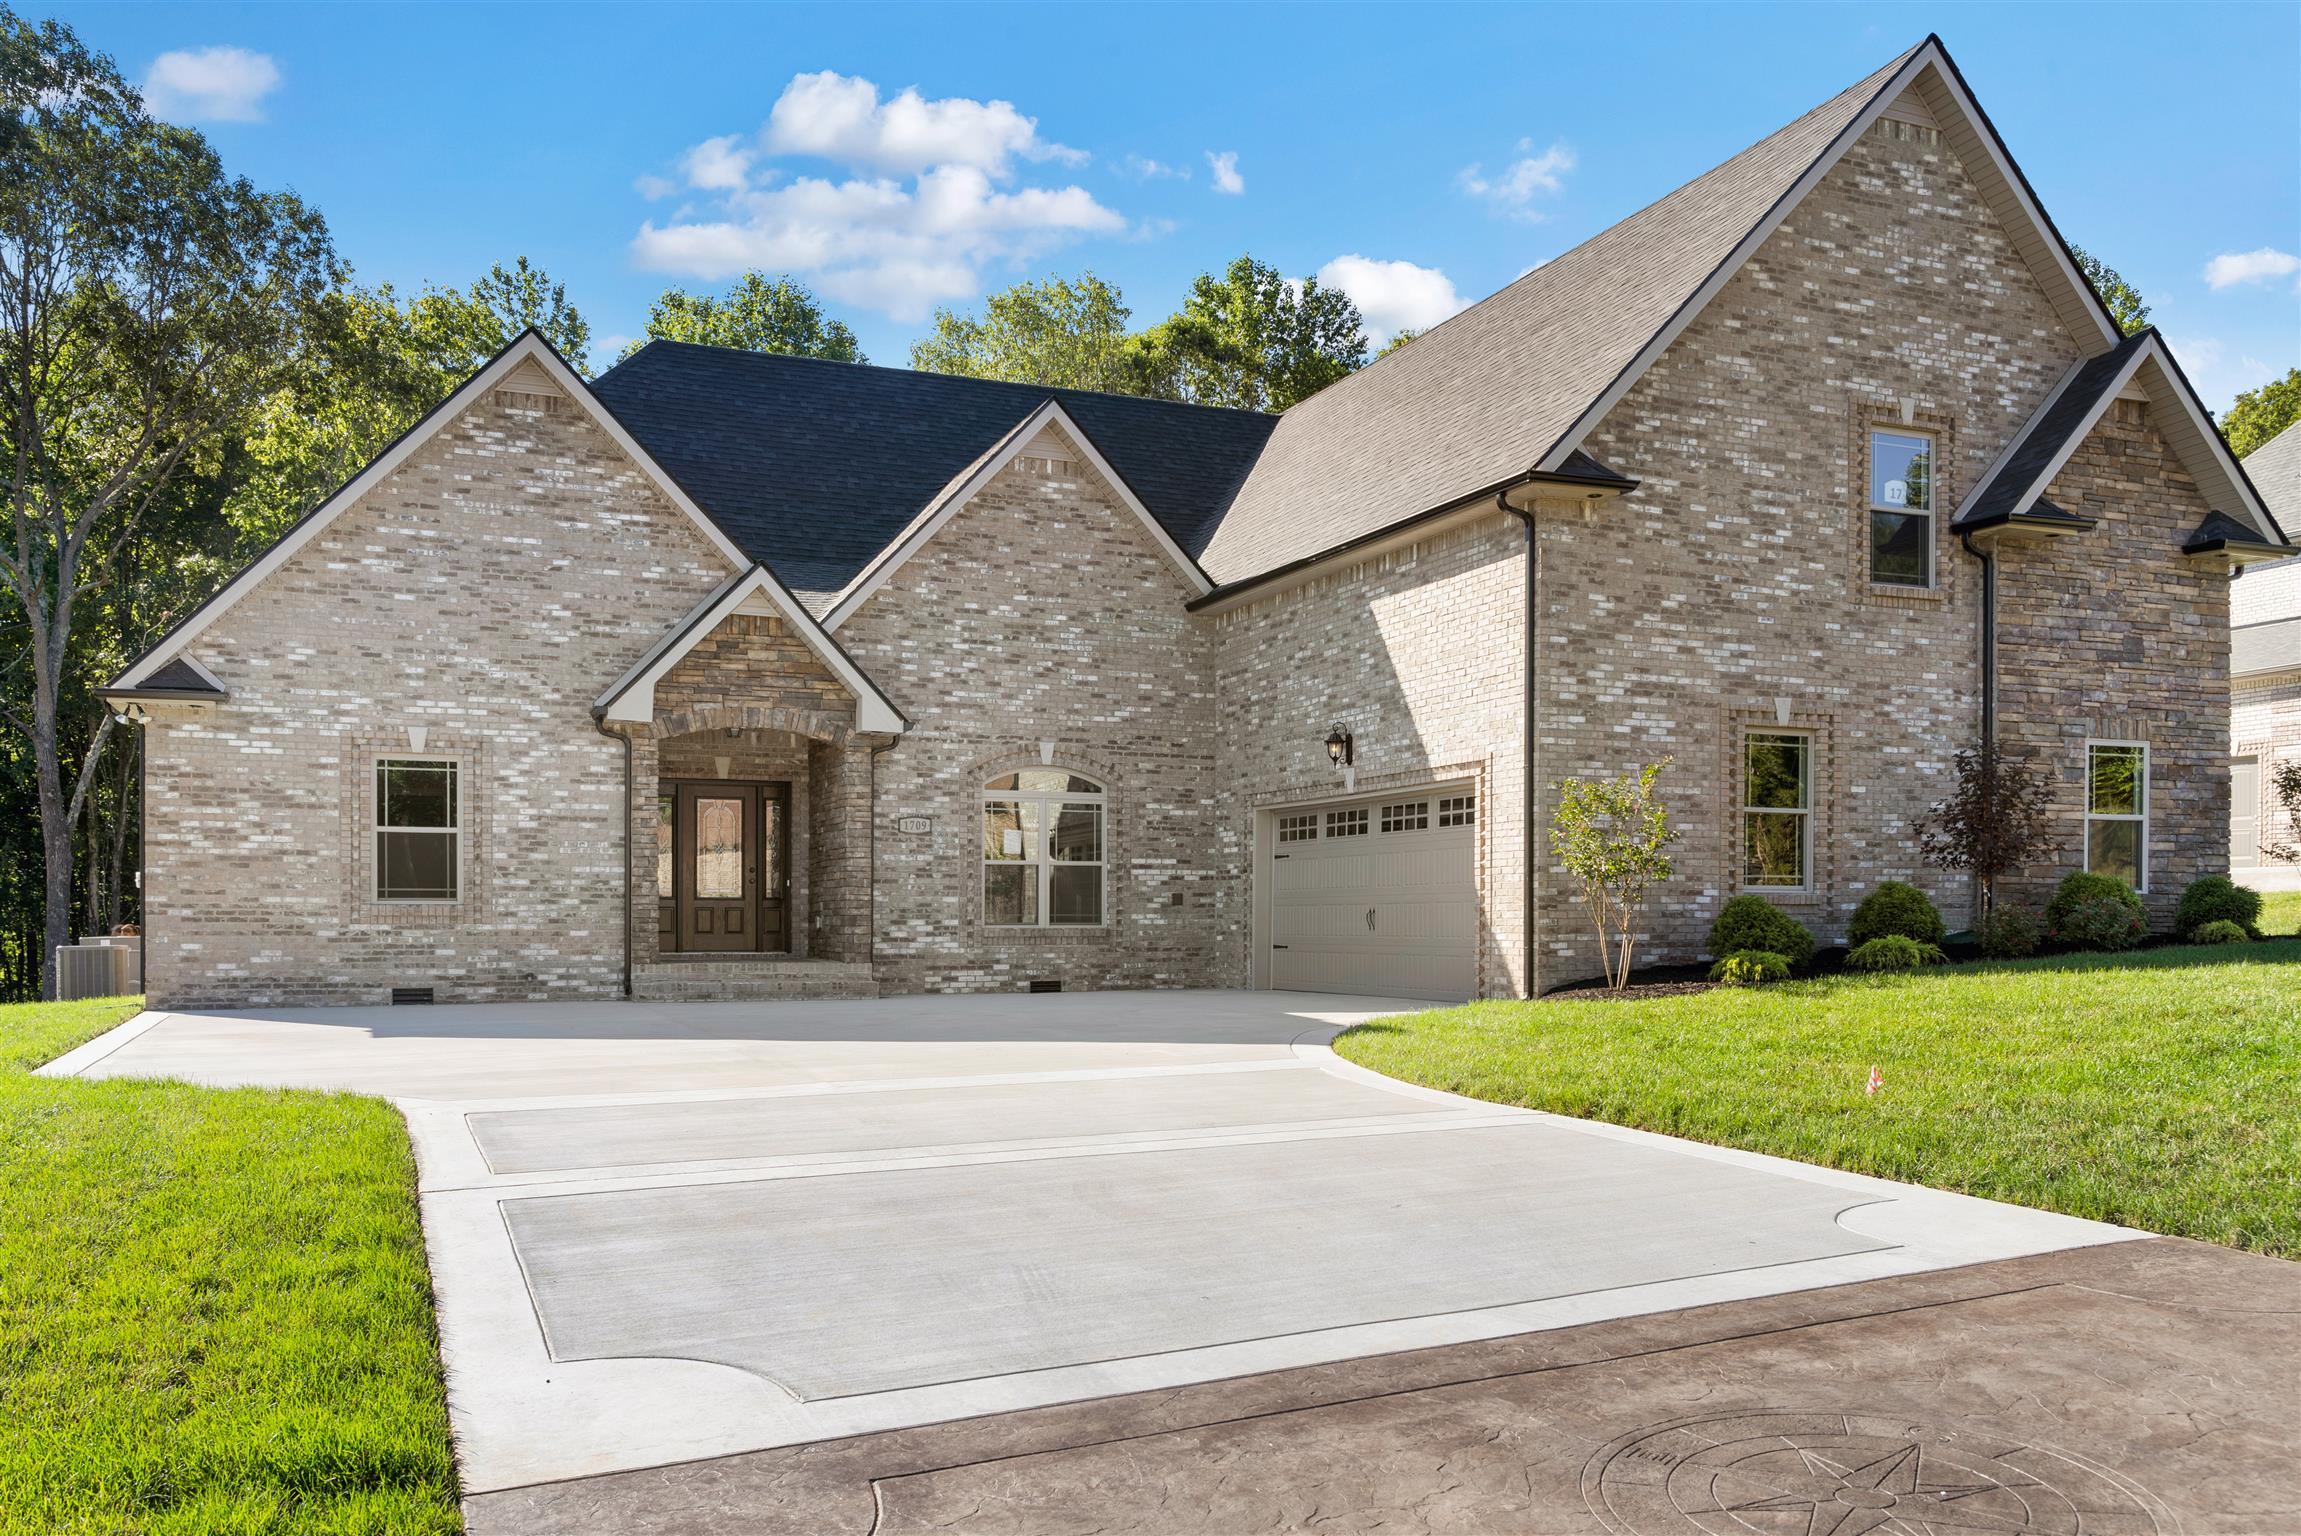 1709 Double R Blvd, Clarksville, TN 37042 - Clarksville, TN real estate listing